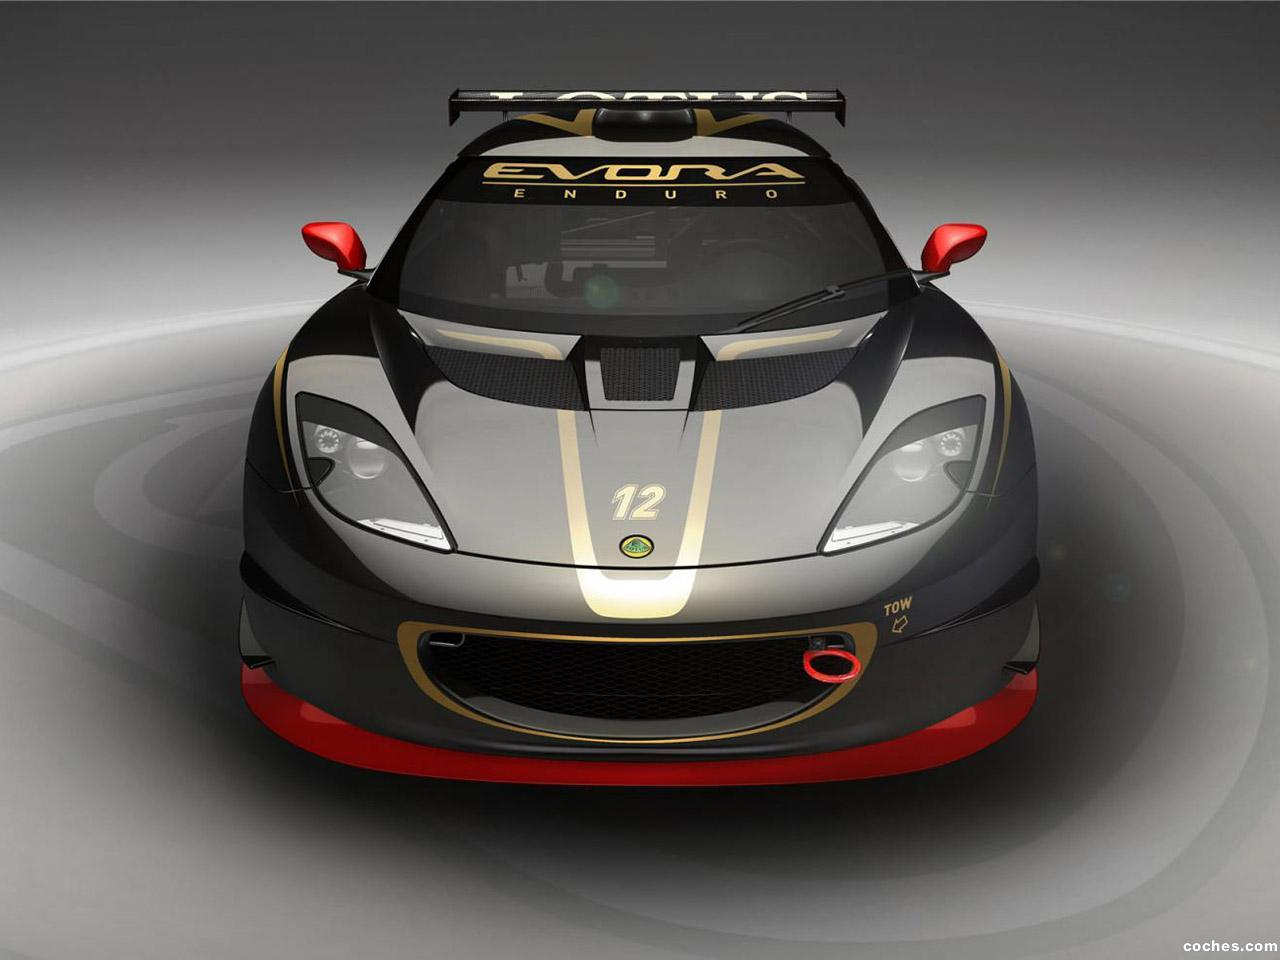 Foto 0 de Lotus Evora Enduro GT Concept 2011